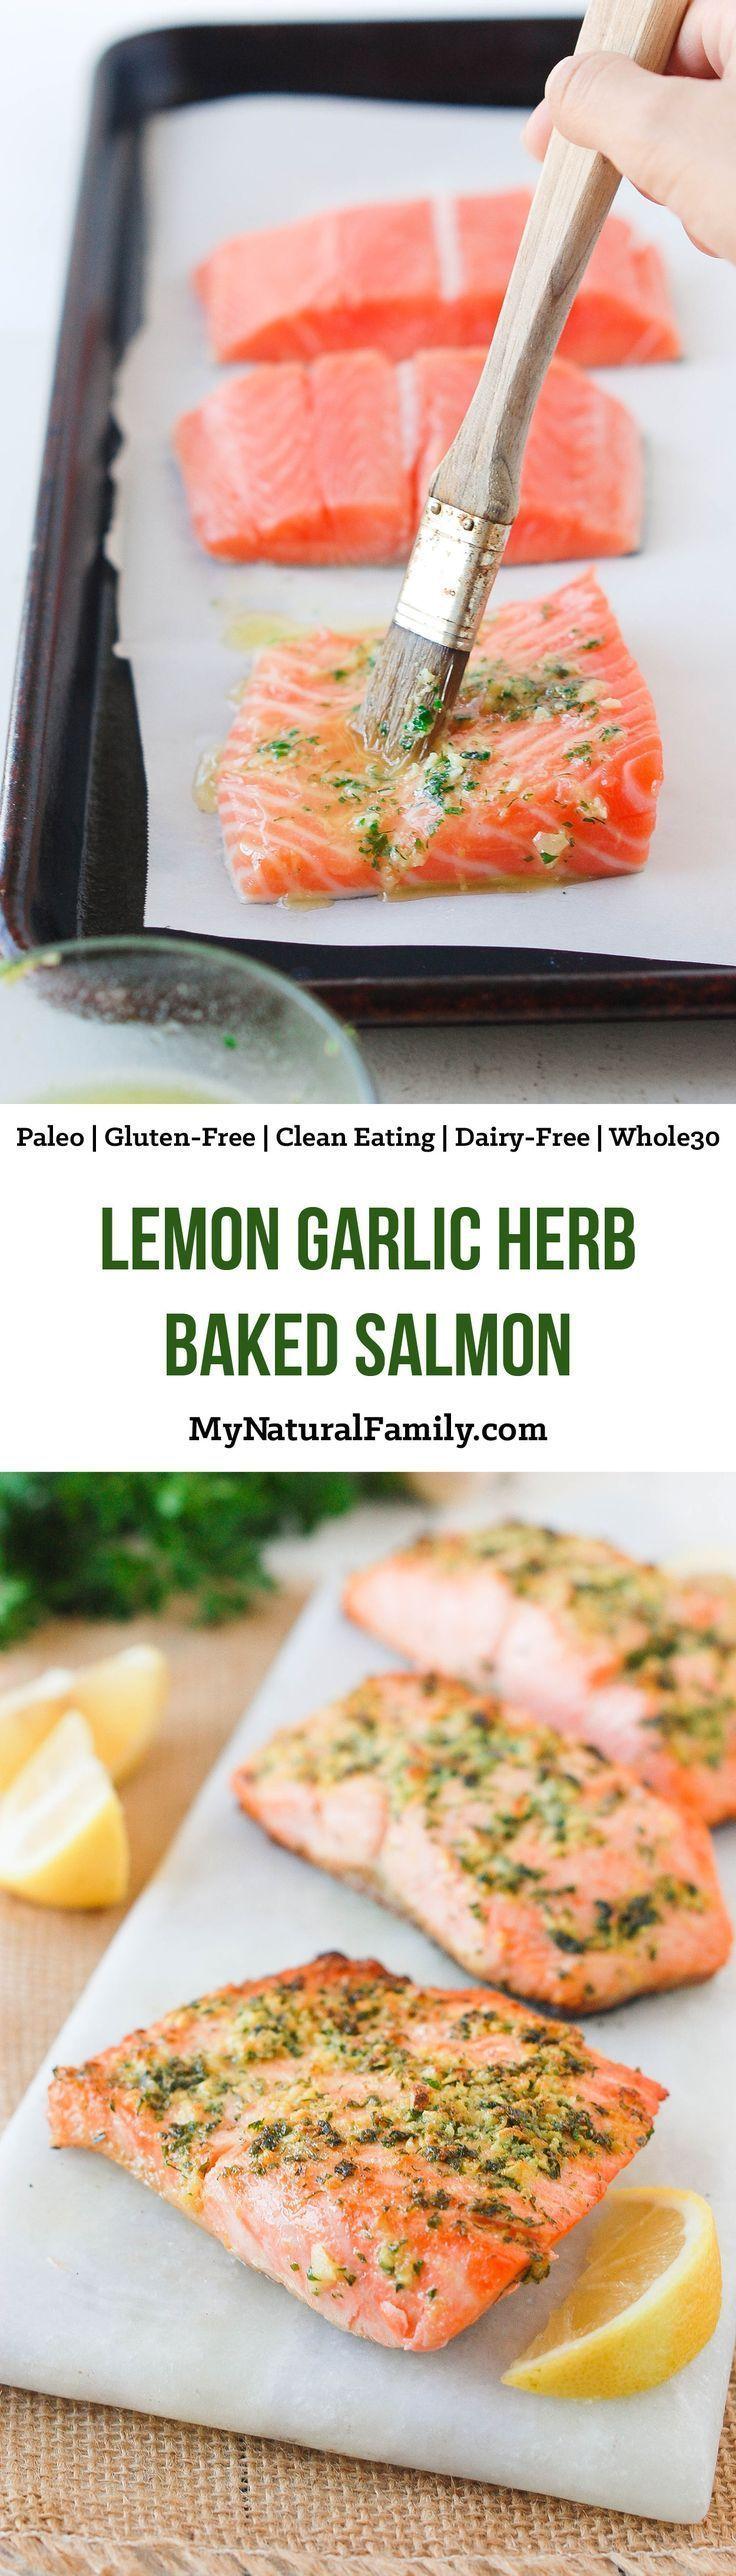 Easy Lemon Garlic Herb Crusted Baked Whole 30 Salmon Recipe Food